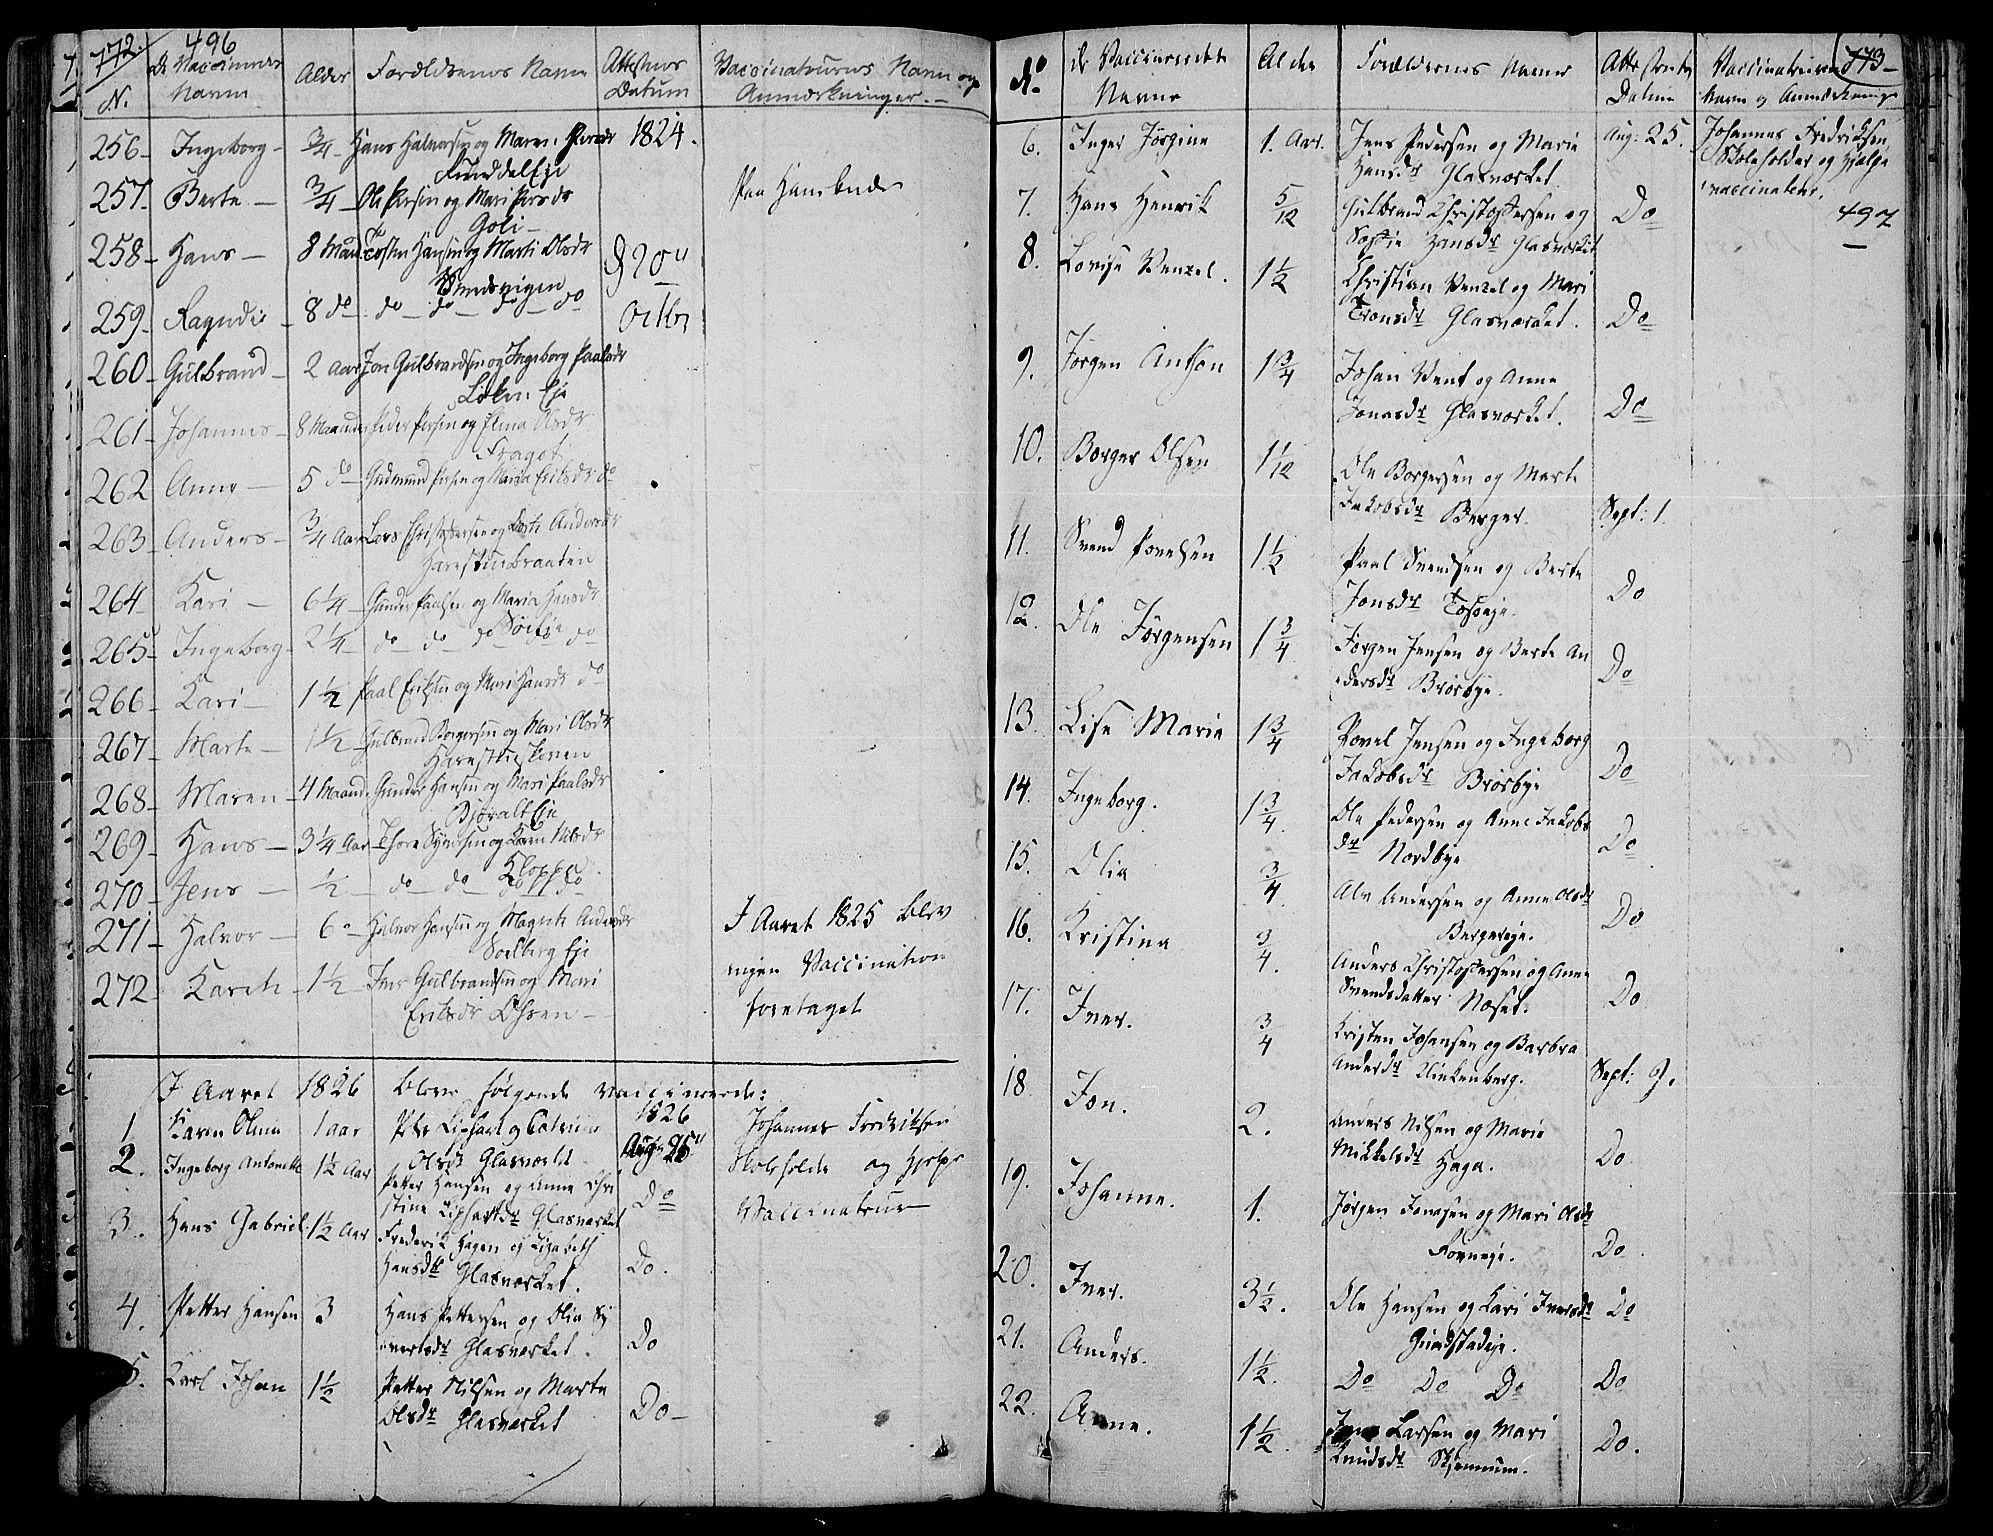 SAH, Jevnaker prestekontor, Ministerialbok nr. 4, 1800-1861, s. 496-497